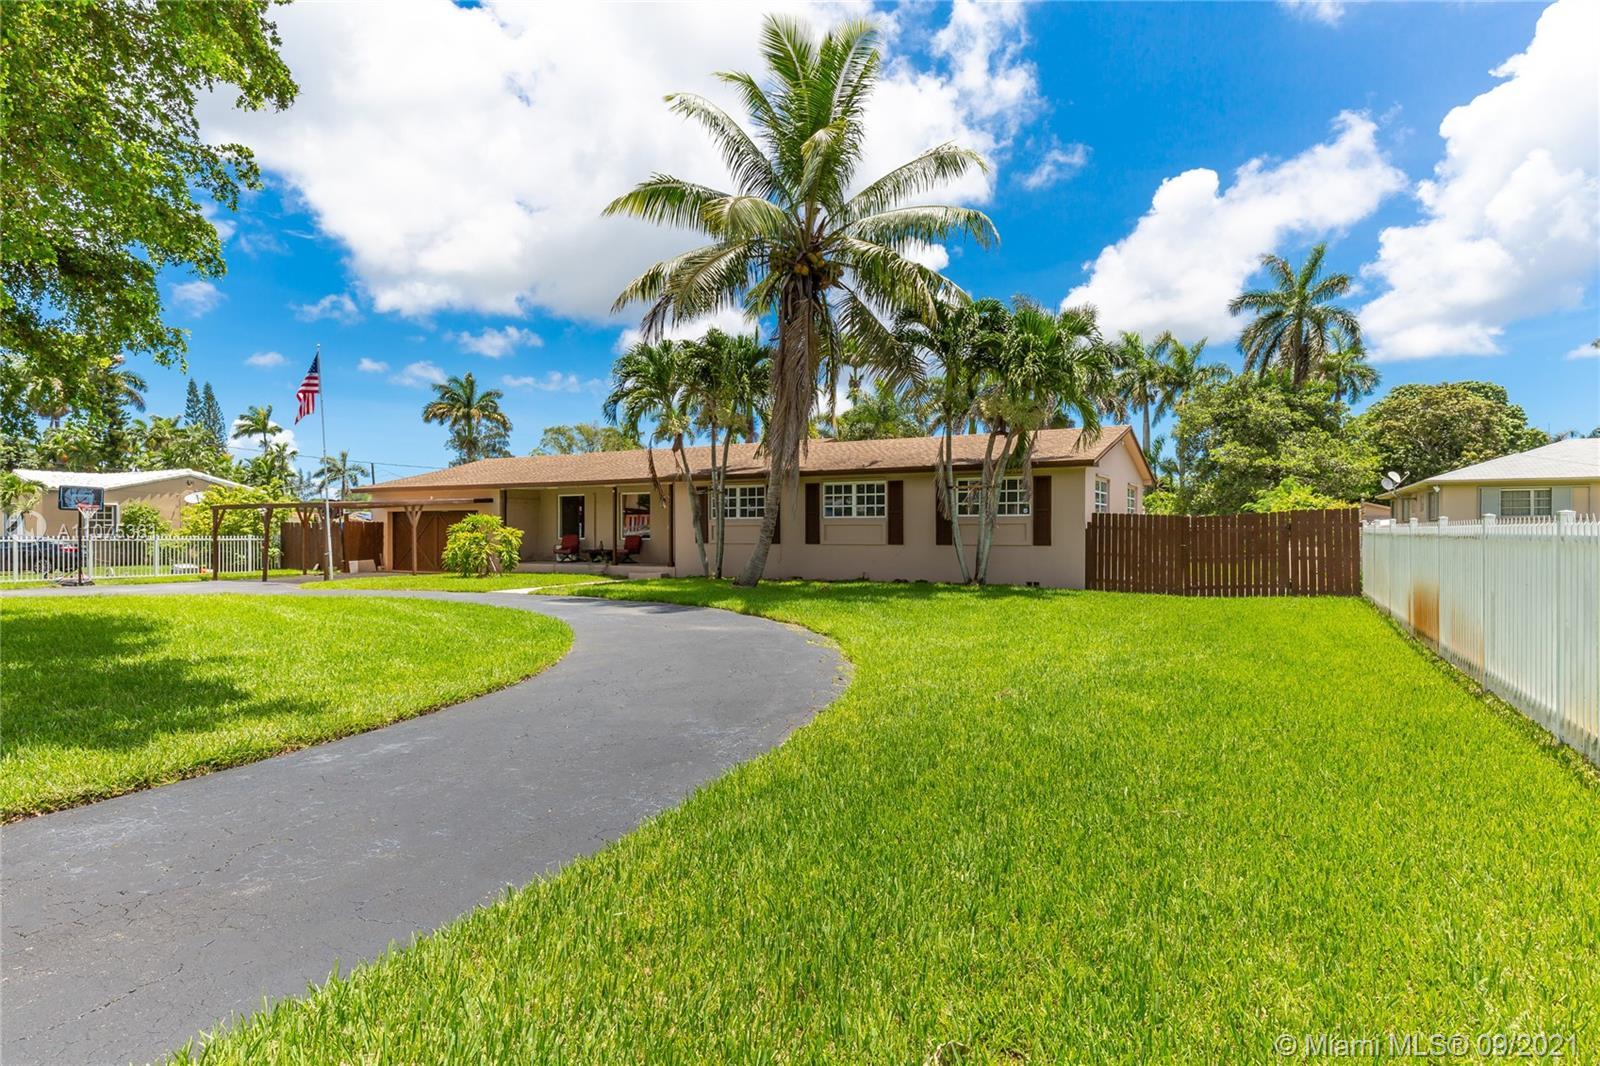 Bisc Gardens - 14205 N Miami Ave, Miami, FL 33168